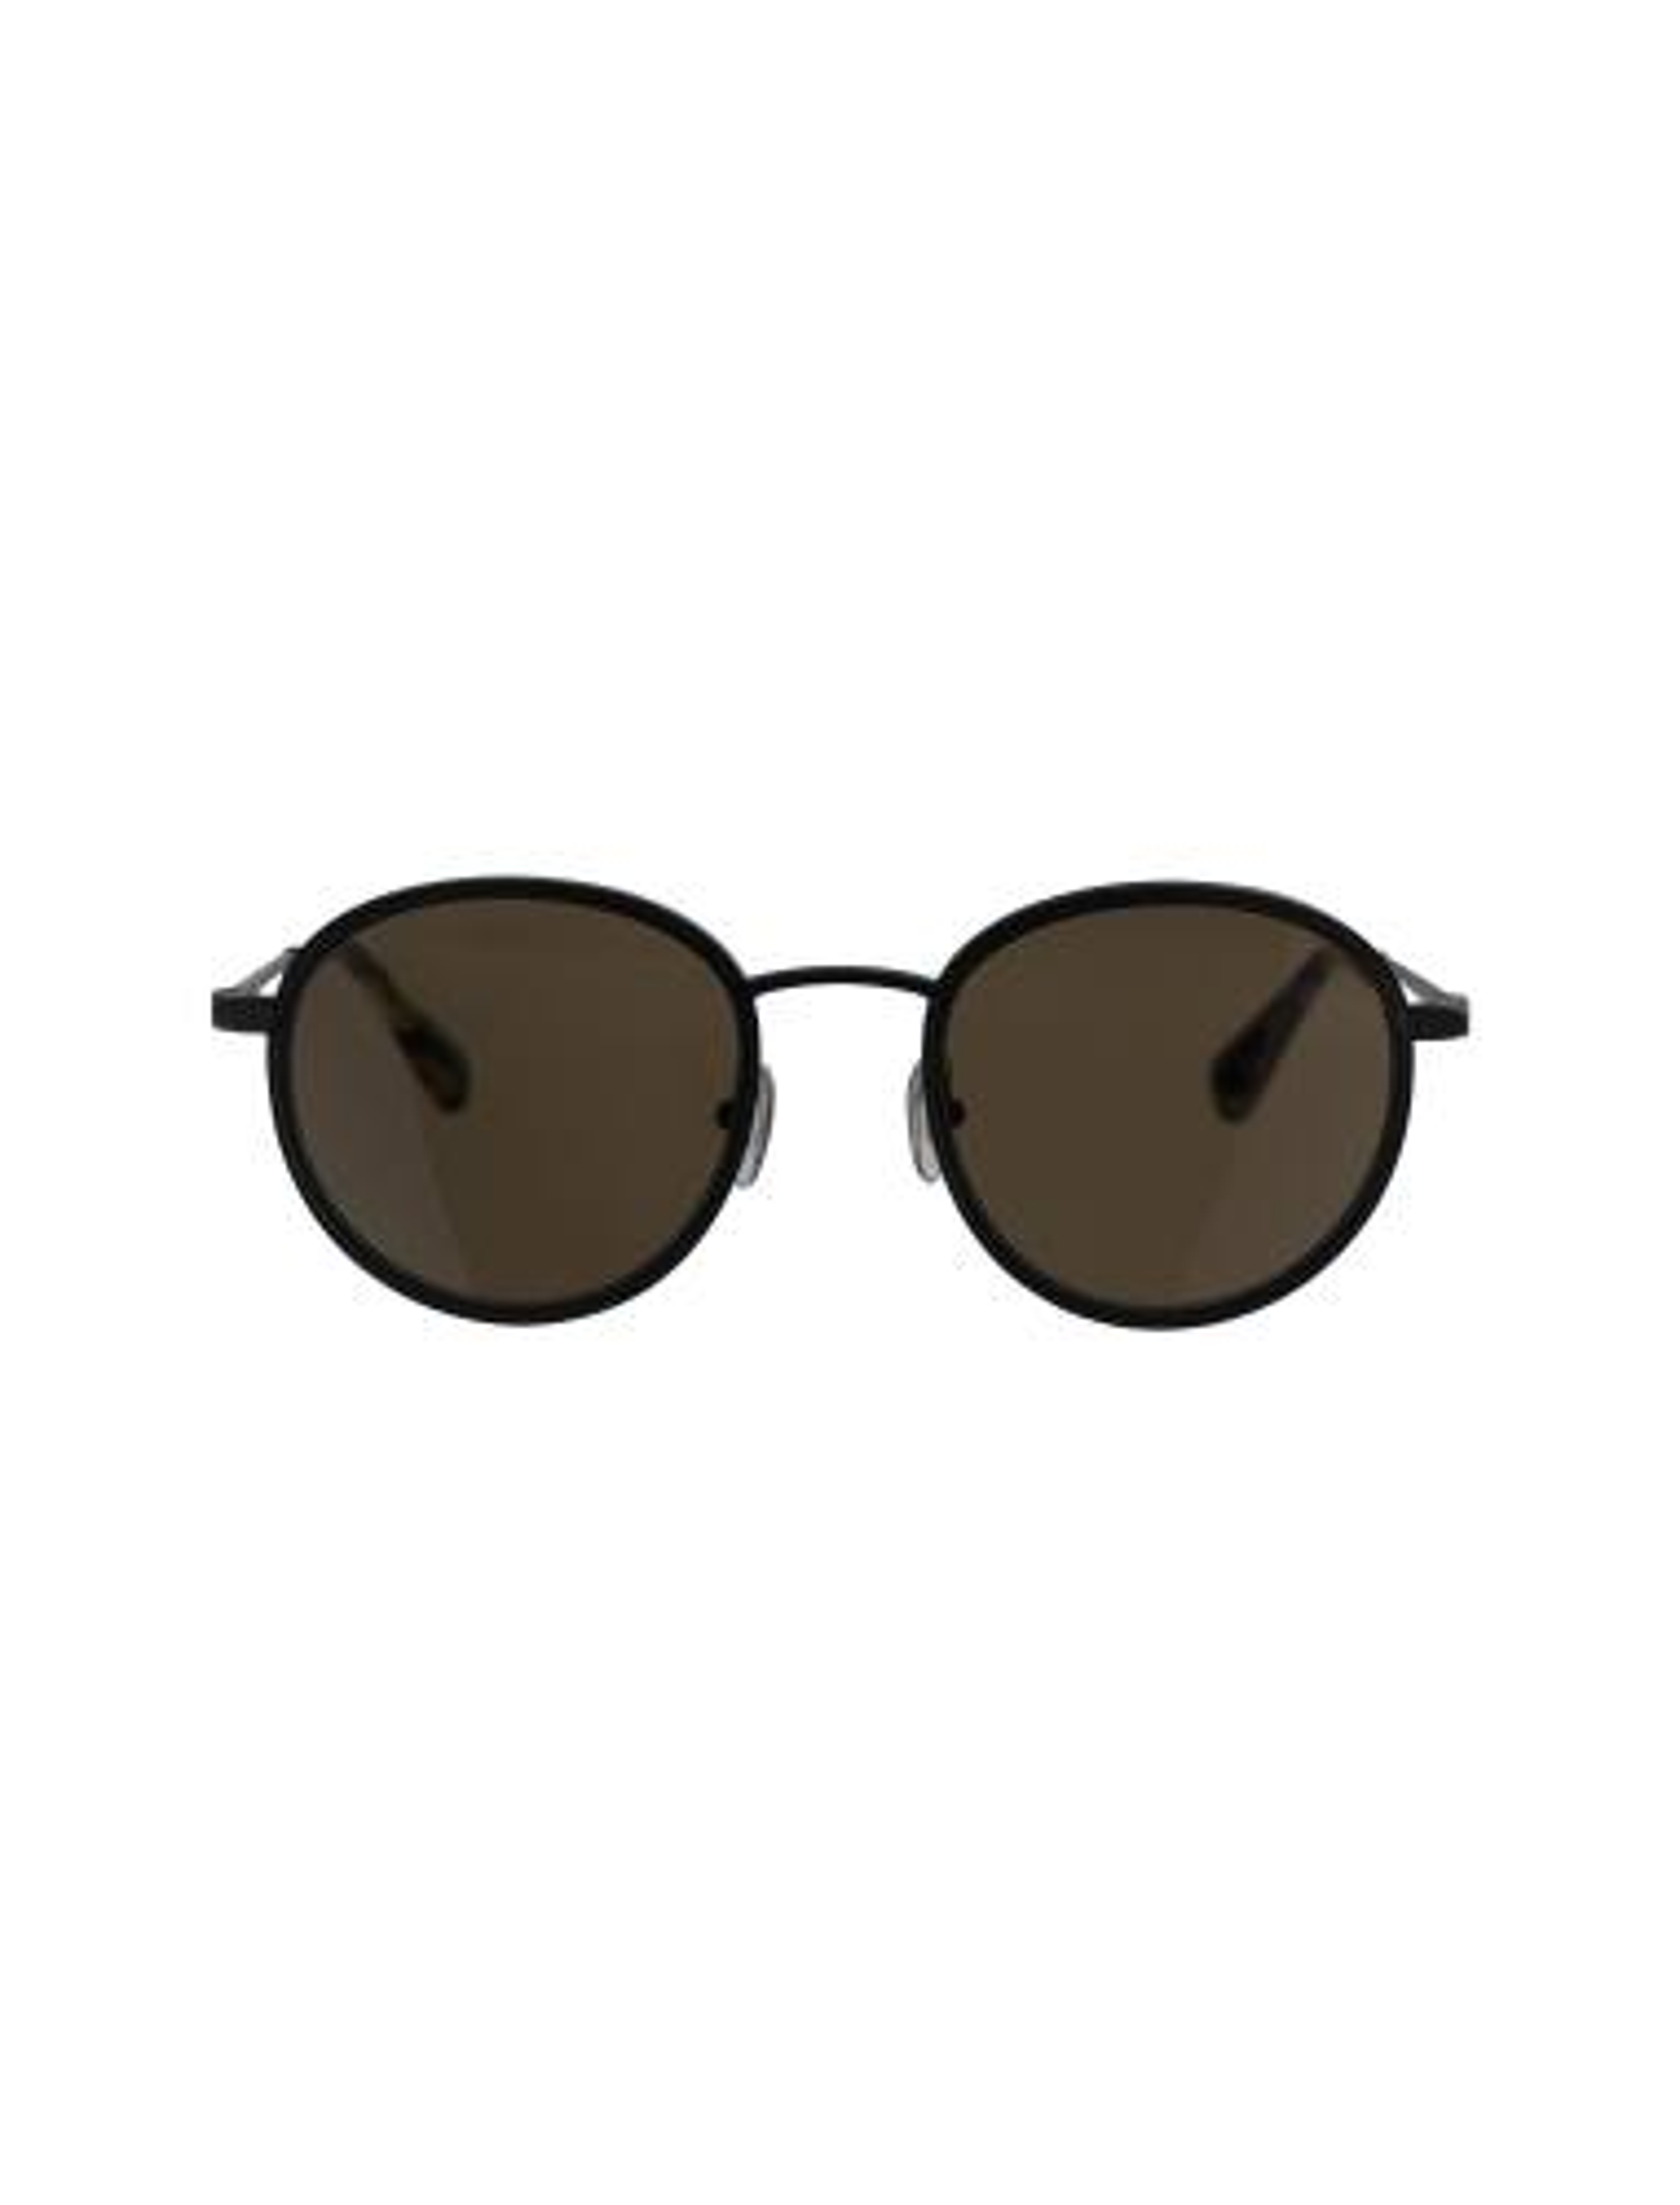 عینک آفتابی گرد بزرگسال - ساندرو